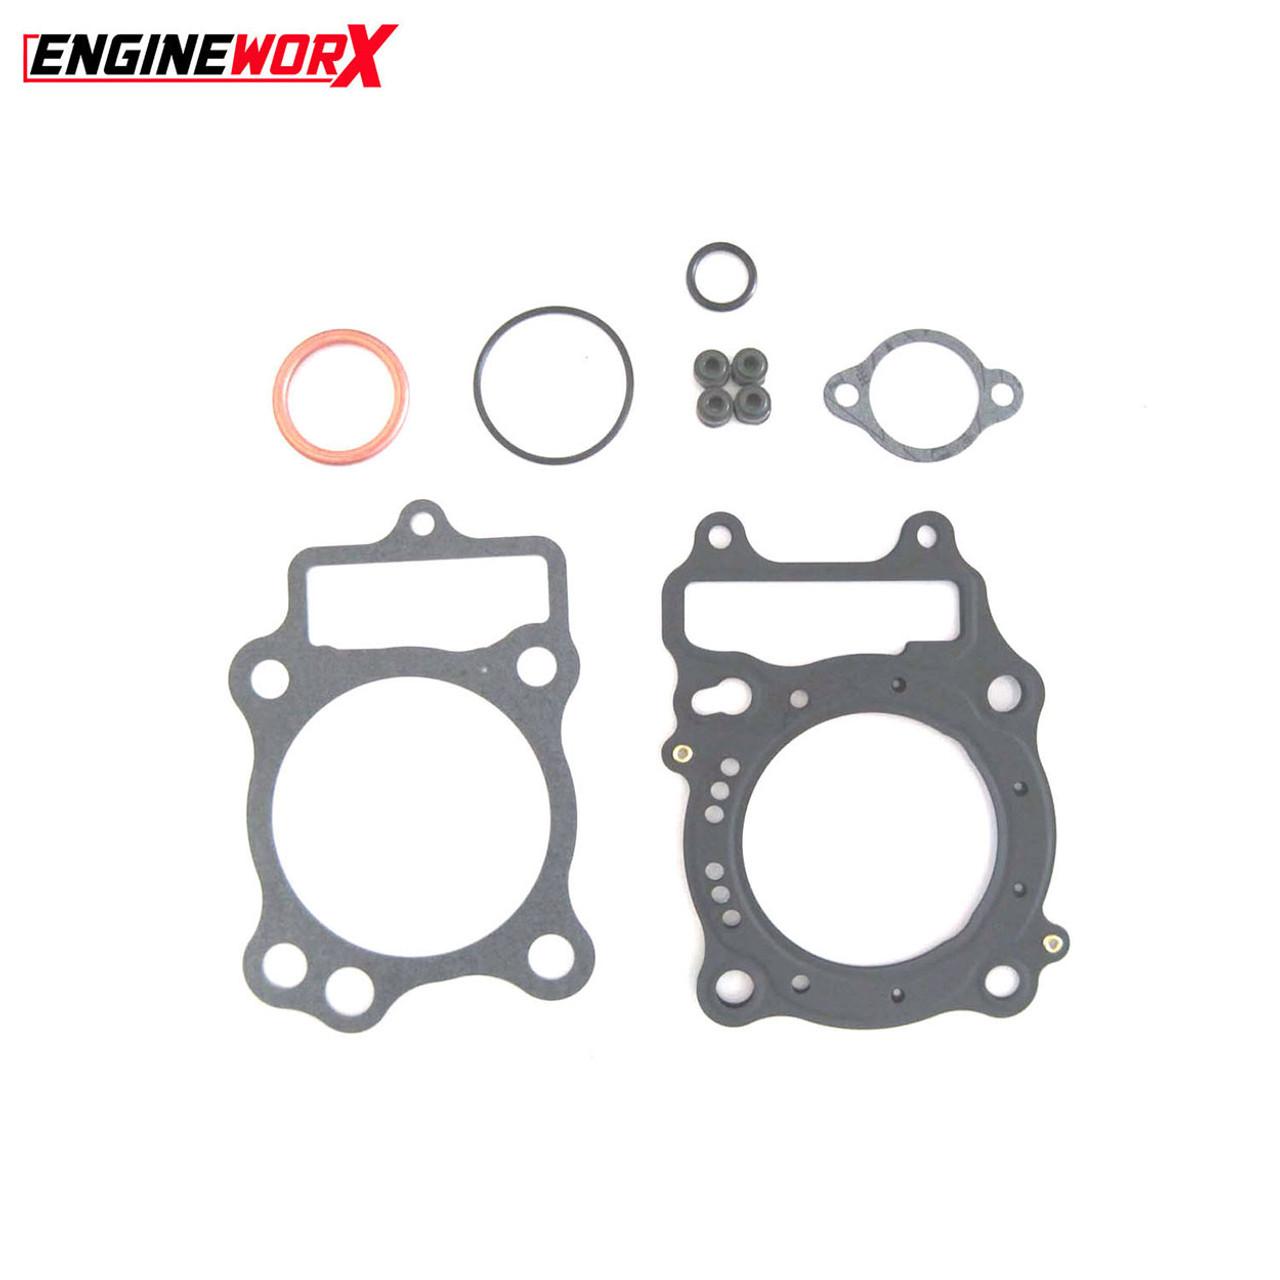 Top Set Engineworx Gasket Kit Honda CRF250 04-07 CRF250X 04-16